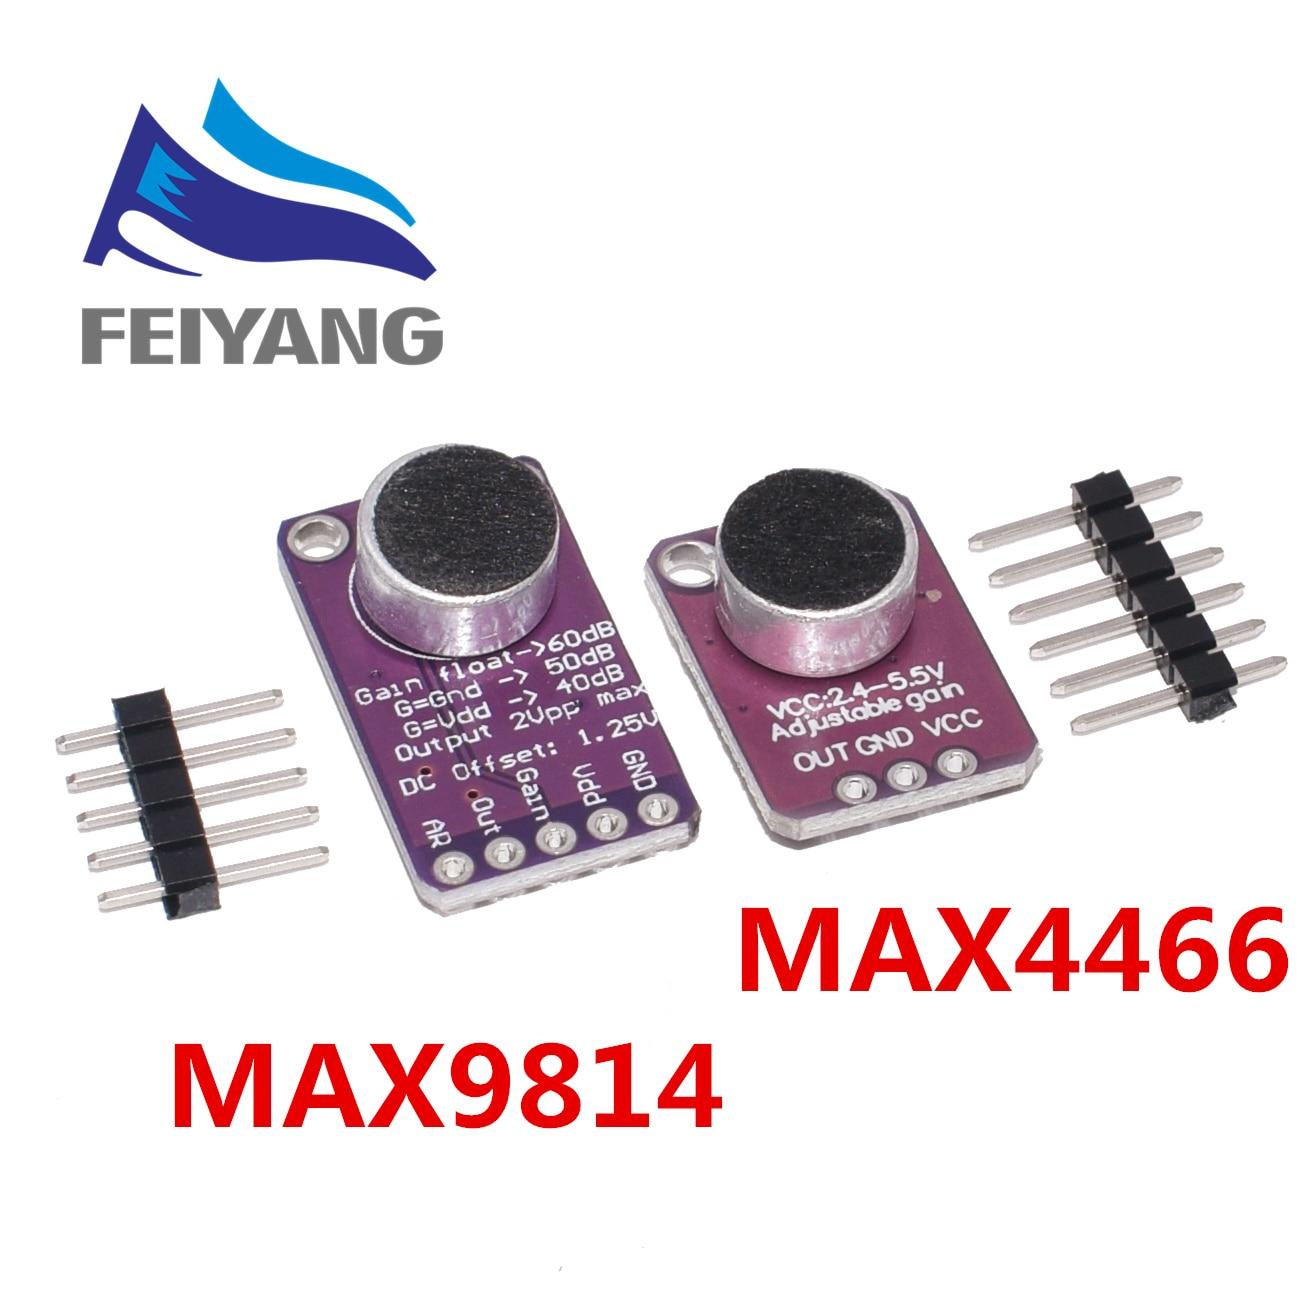 10PCS Electret Microphone Amplifier Stable MAX9814 module Auto Gain Control MAX4466